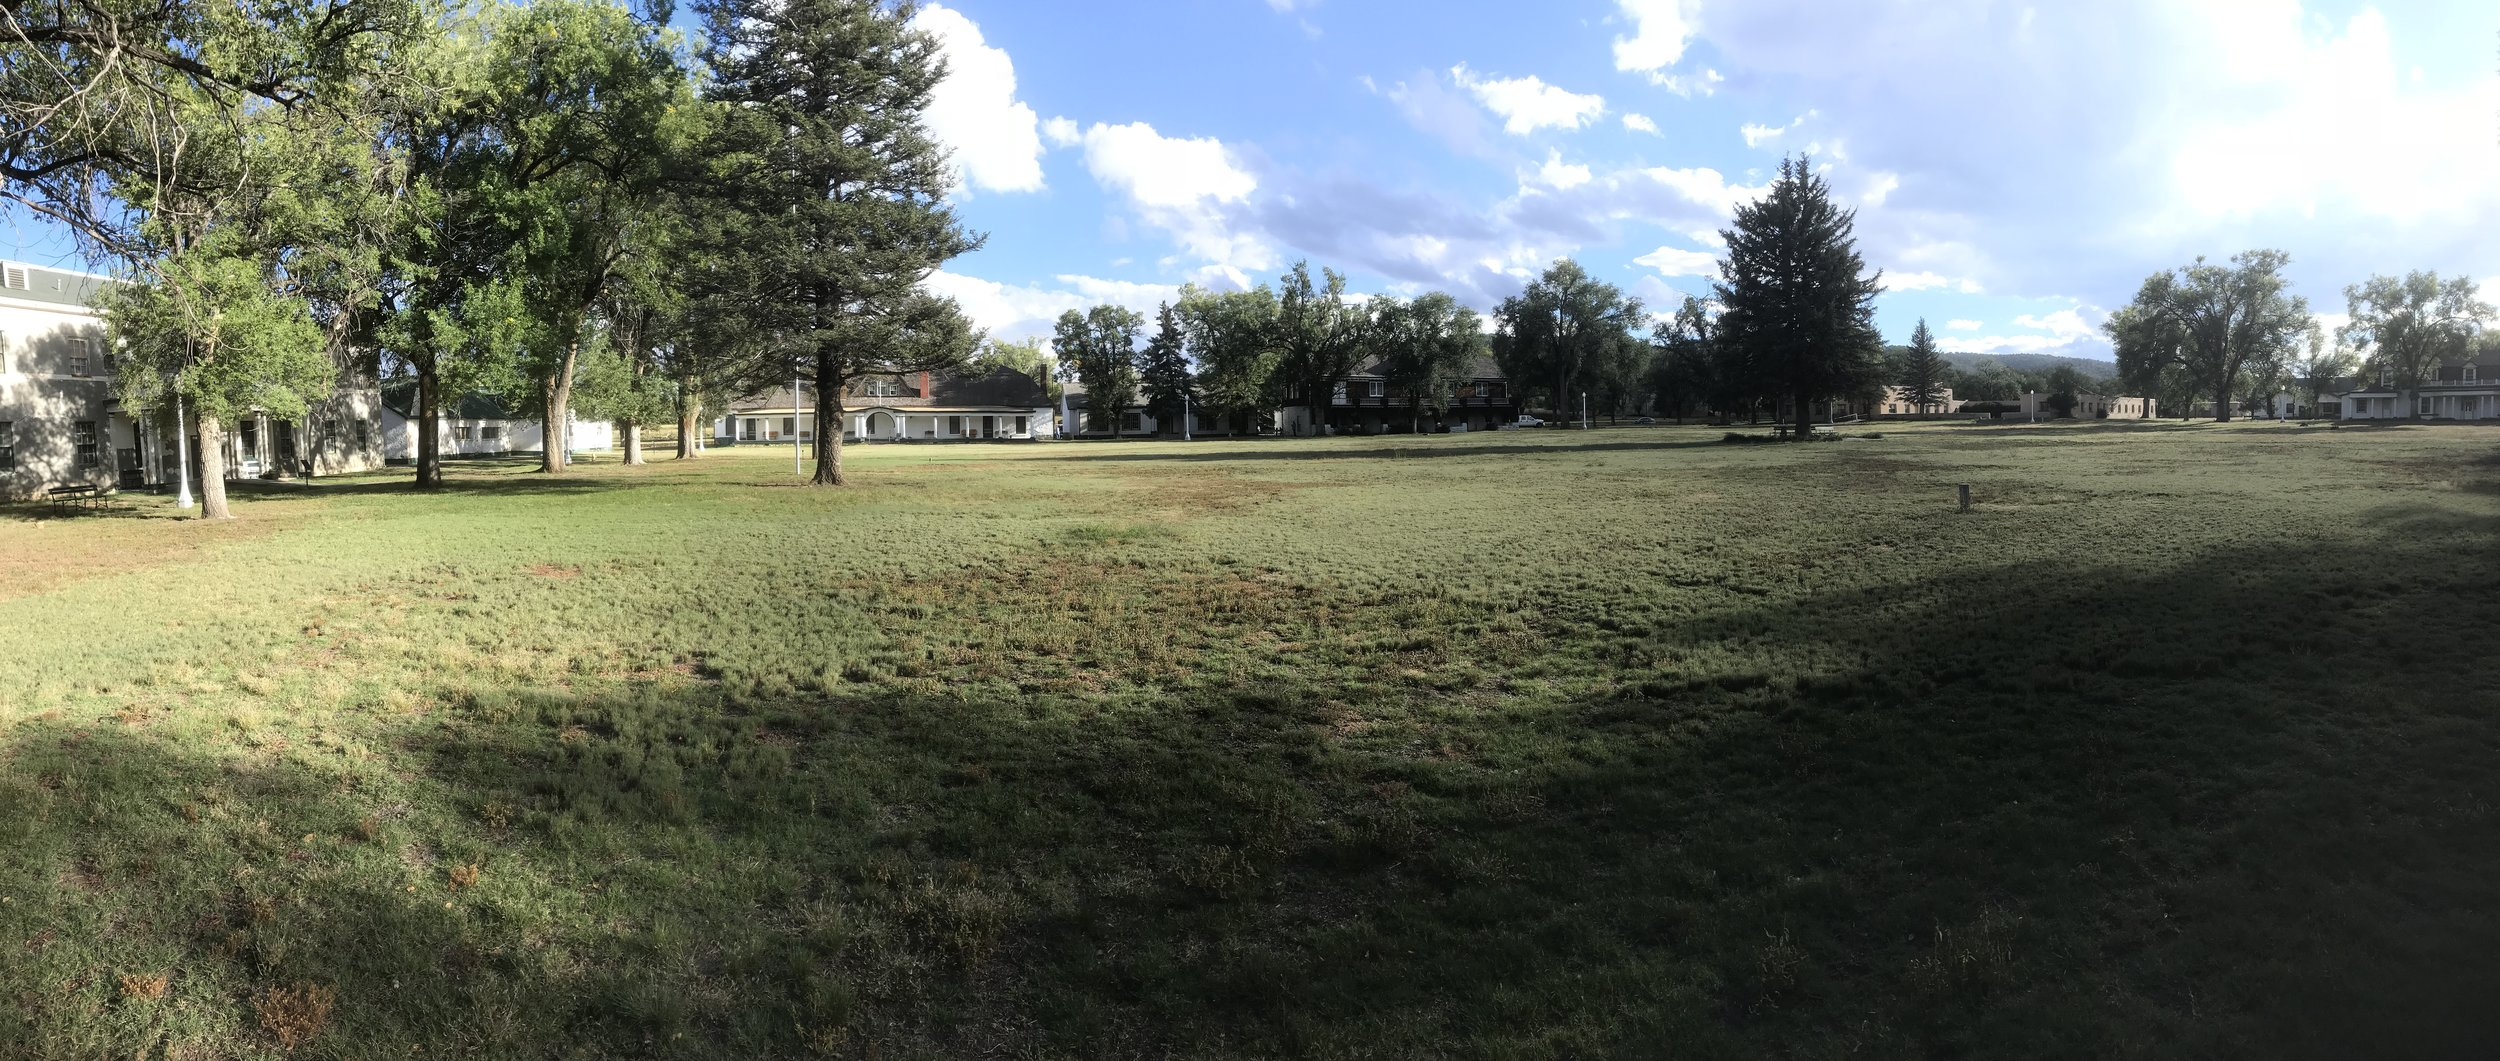 Fort Stanton Parade Ground